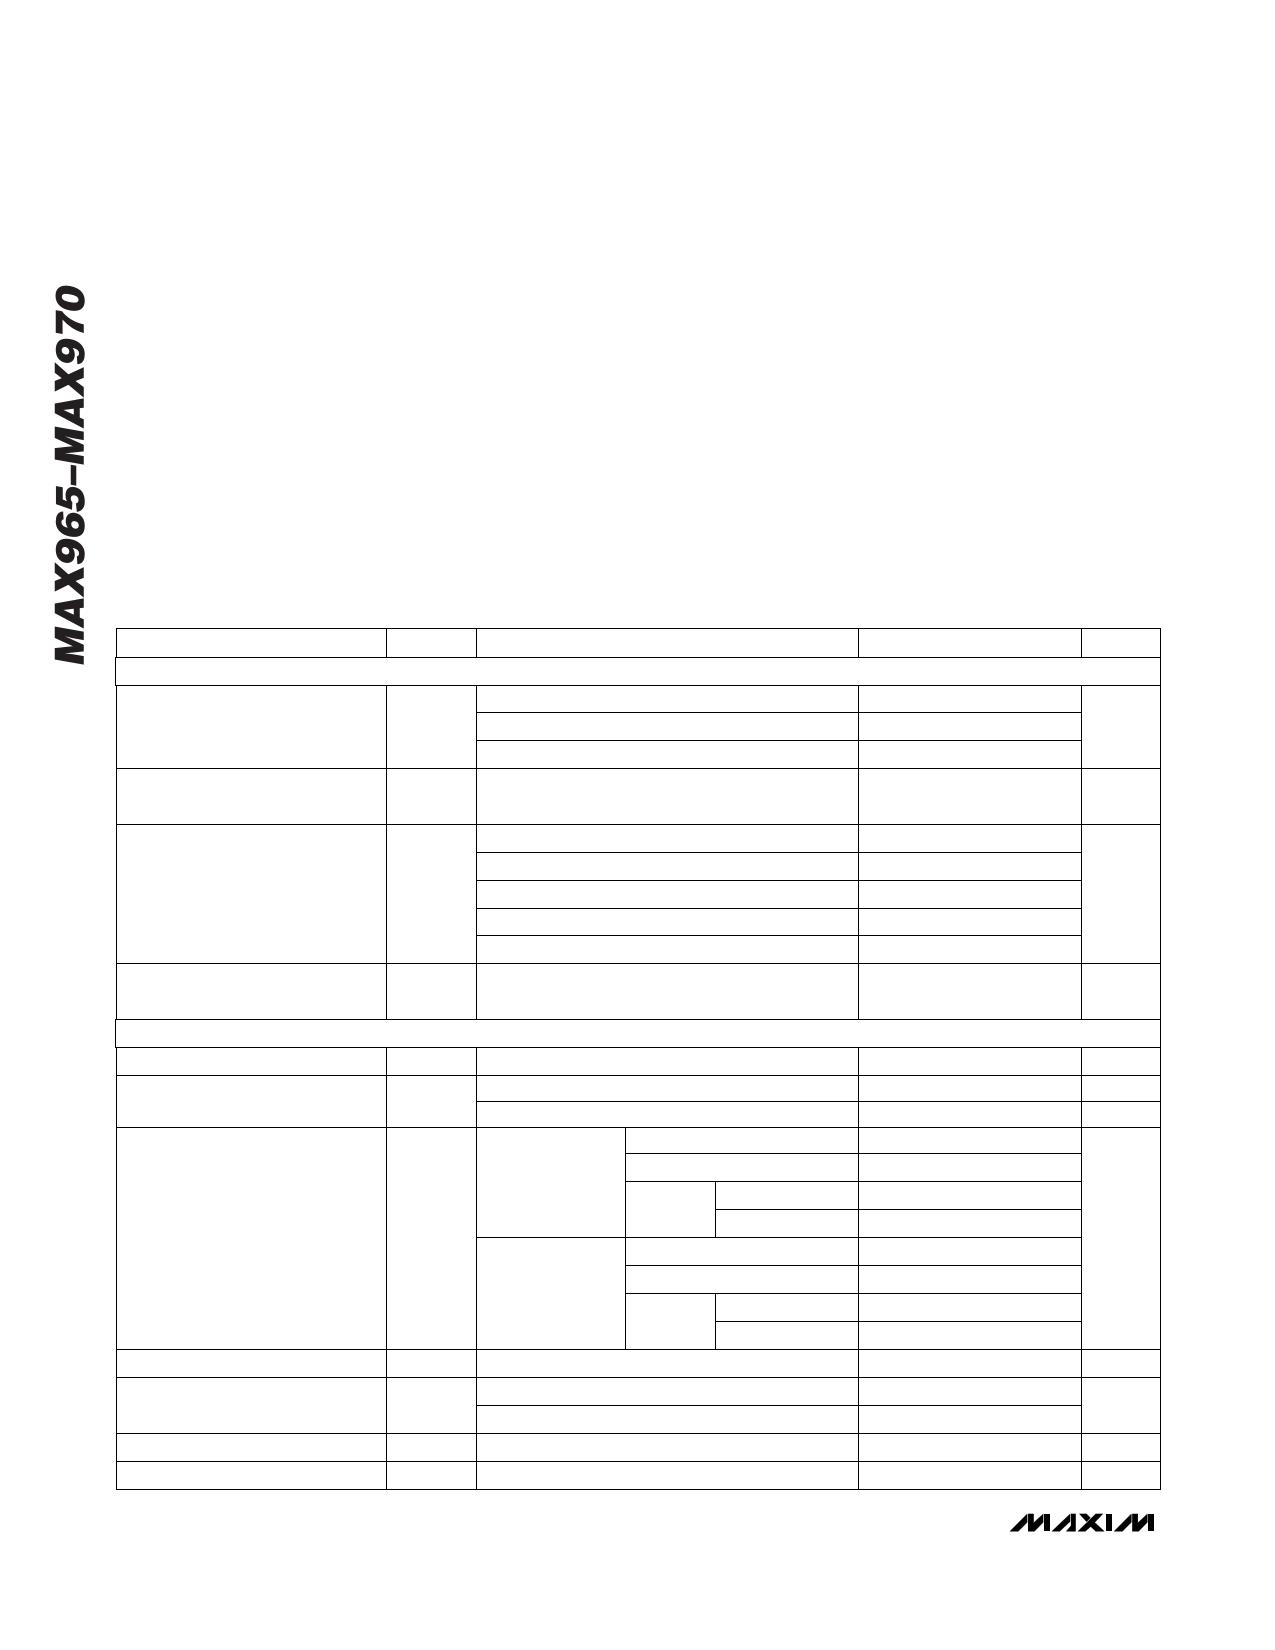 ultra low voltage filetype pdf